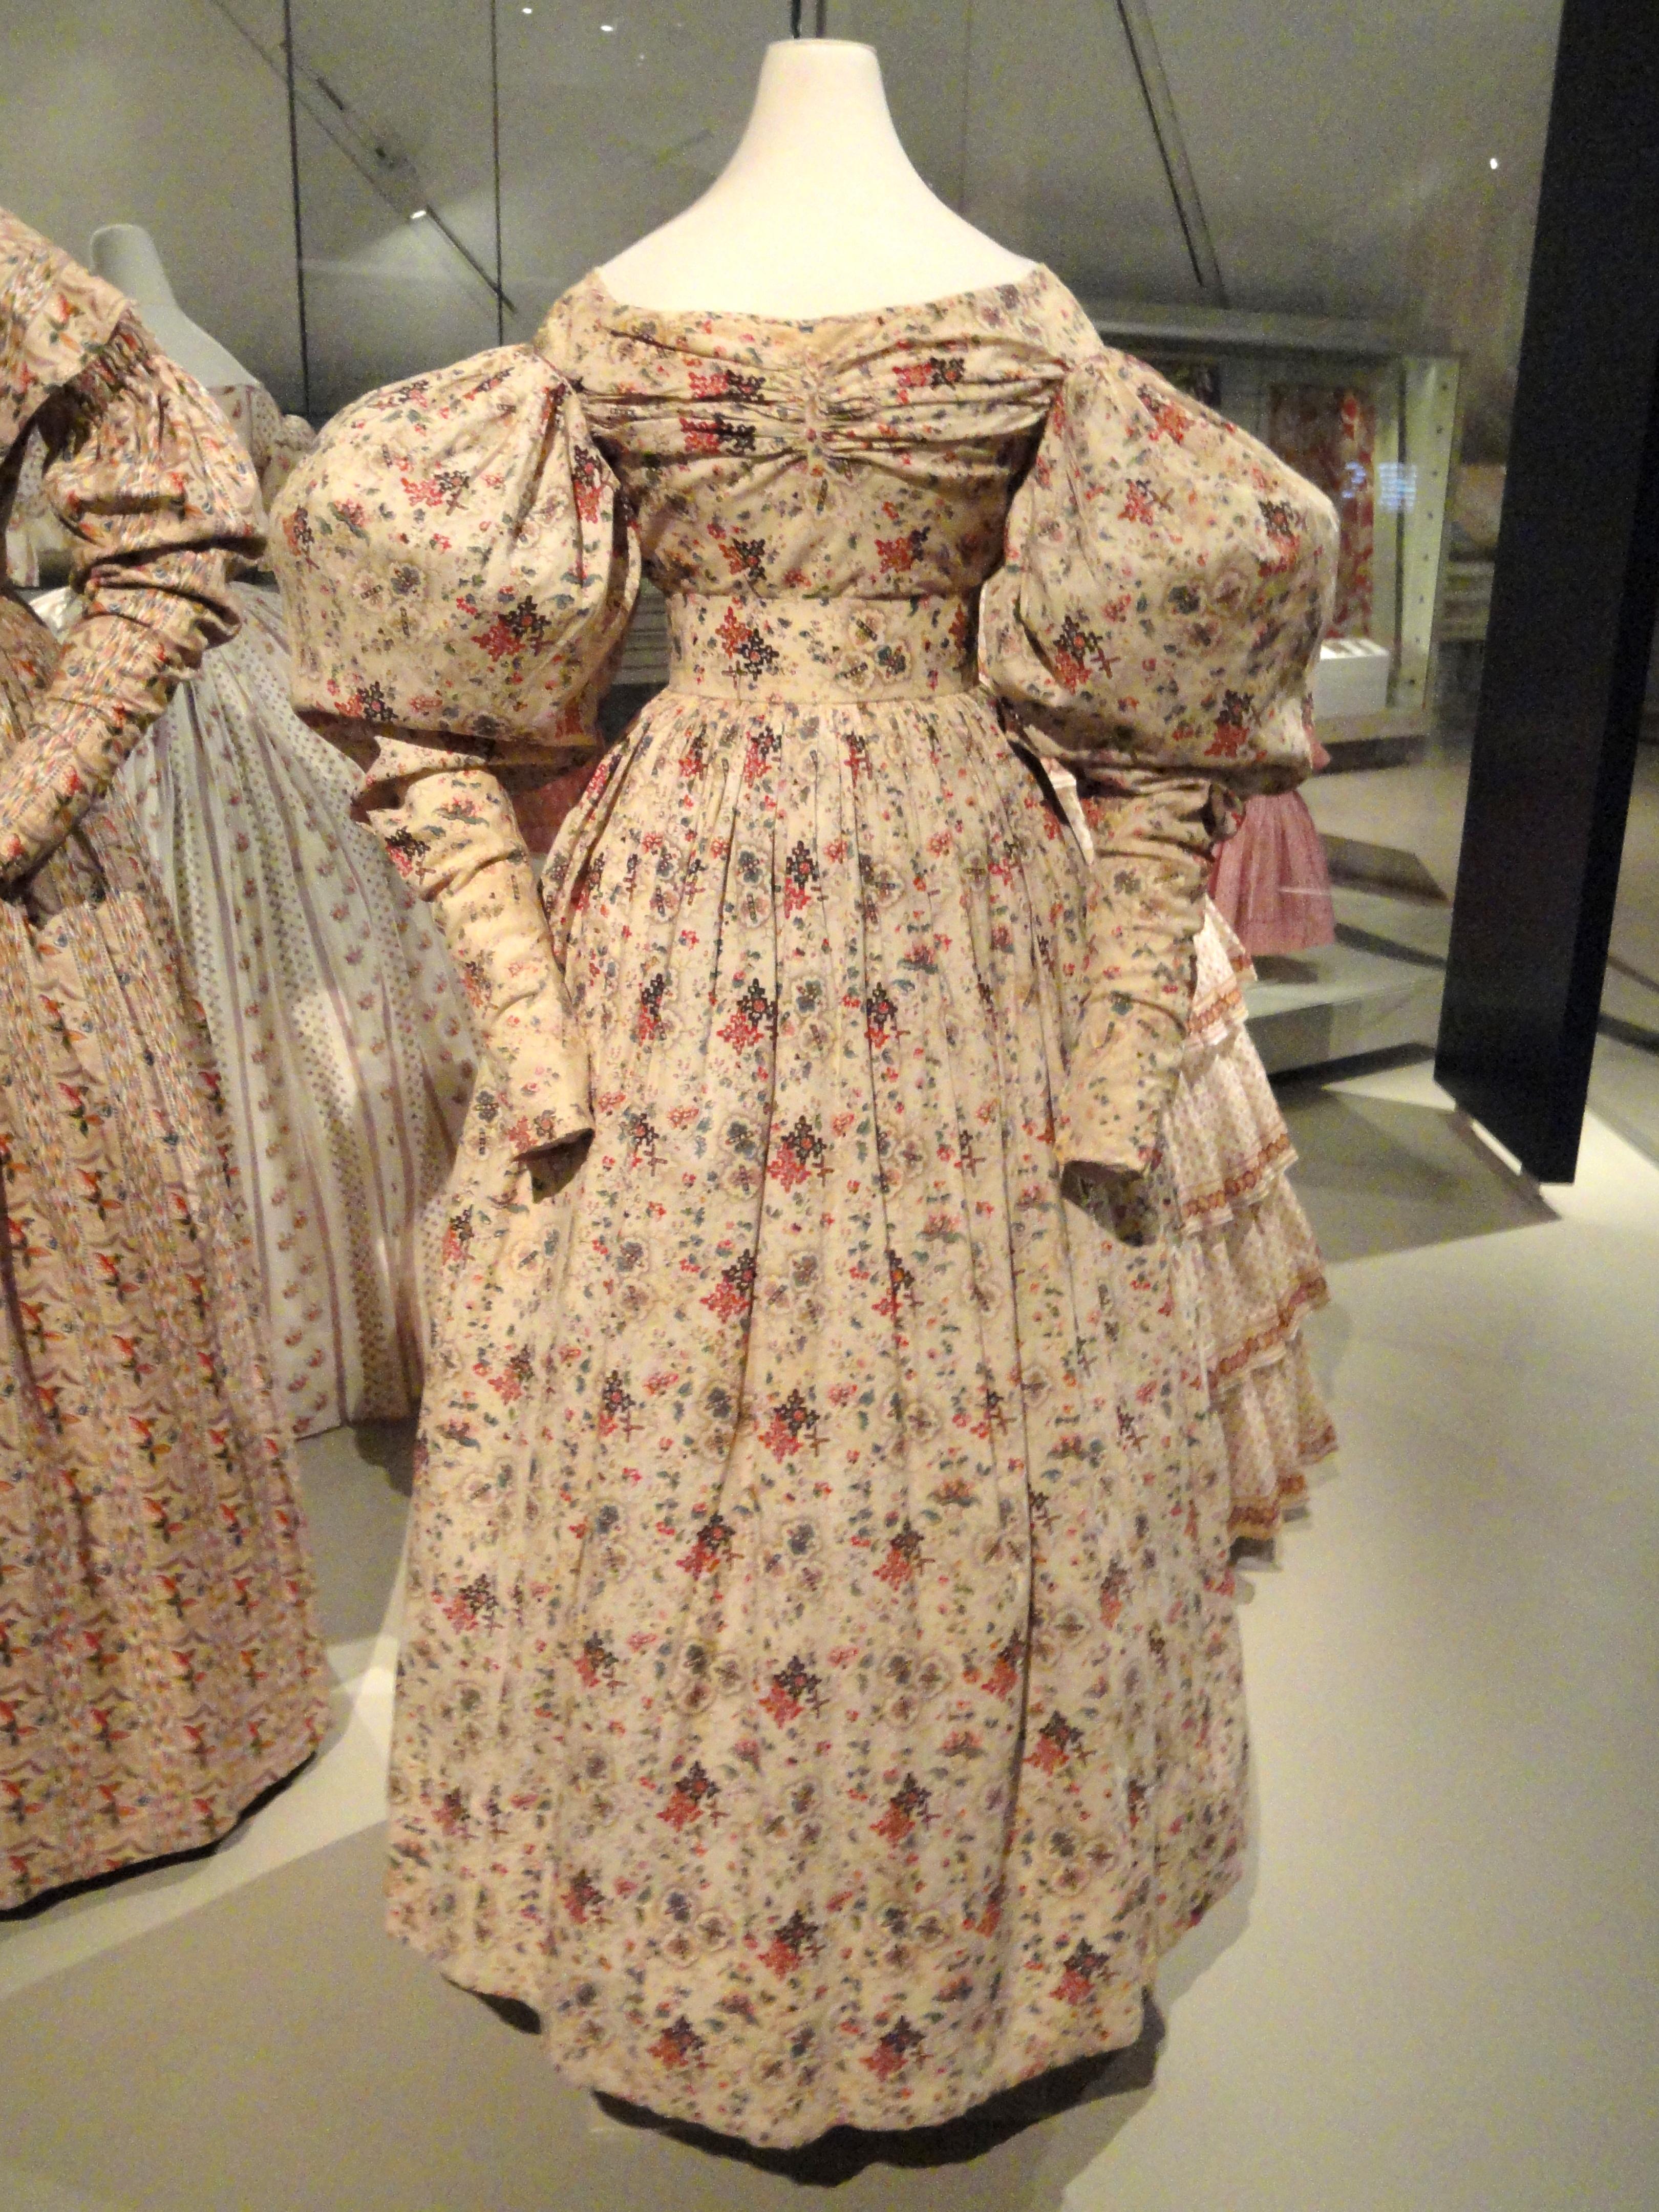 filewomans day dress massachusetts united states 1826